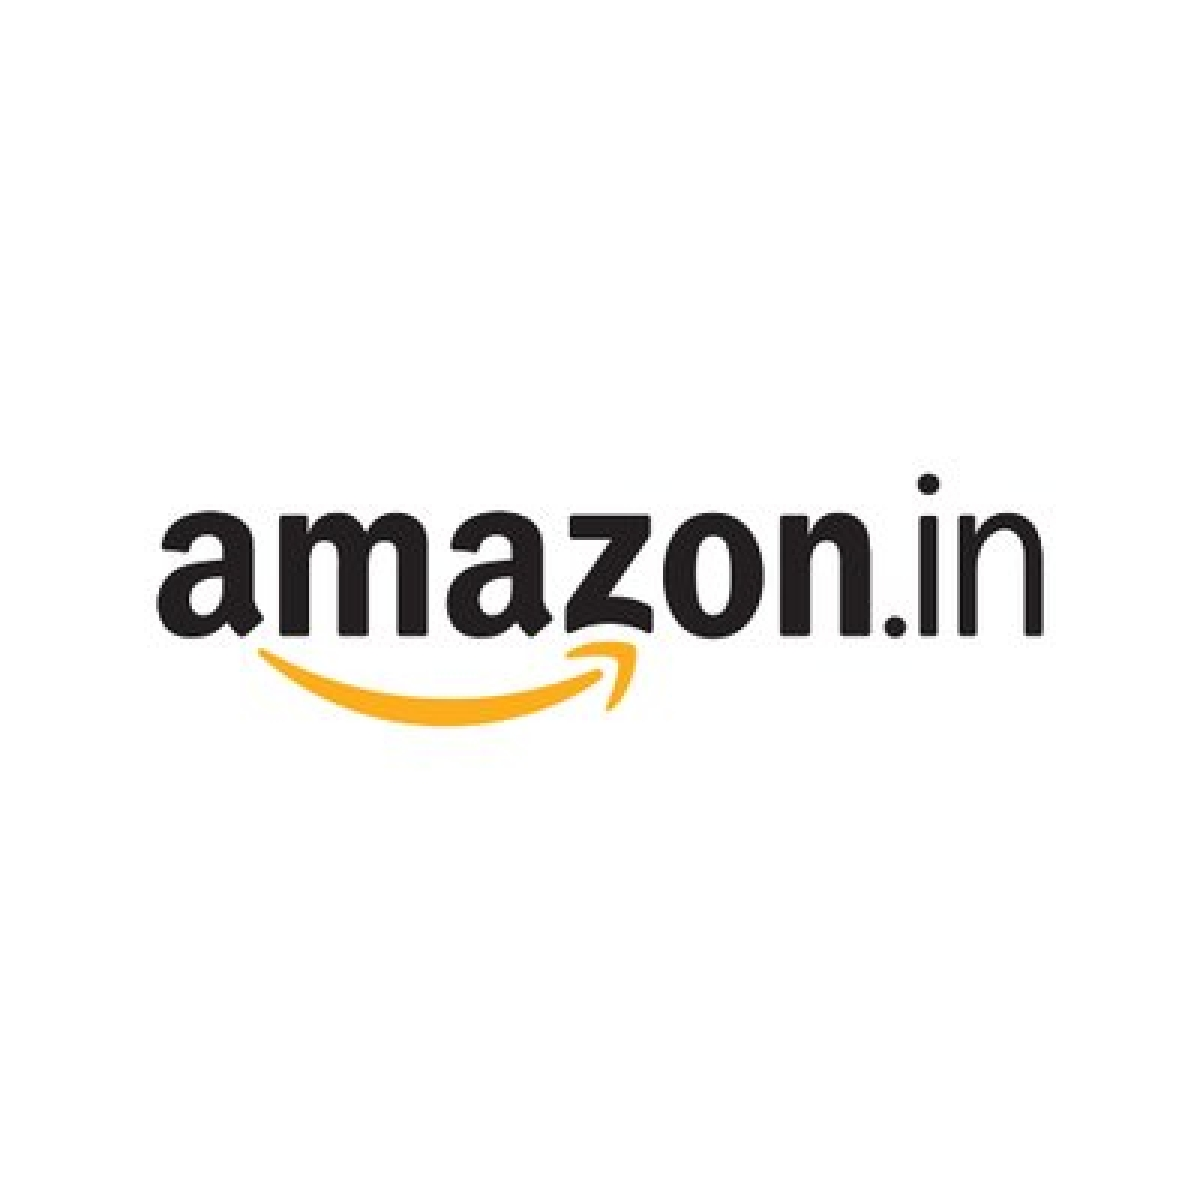 Amazon India launches new warehouse in Ludhiana